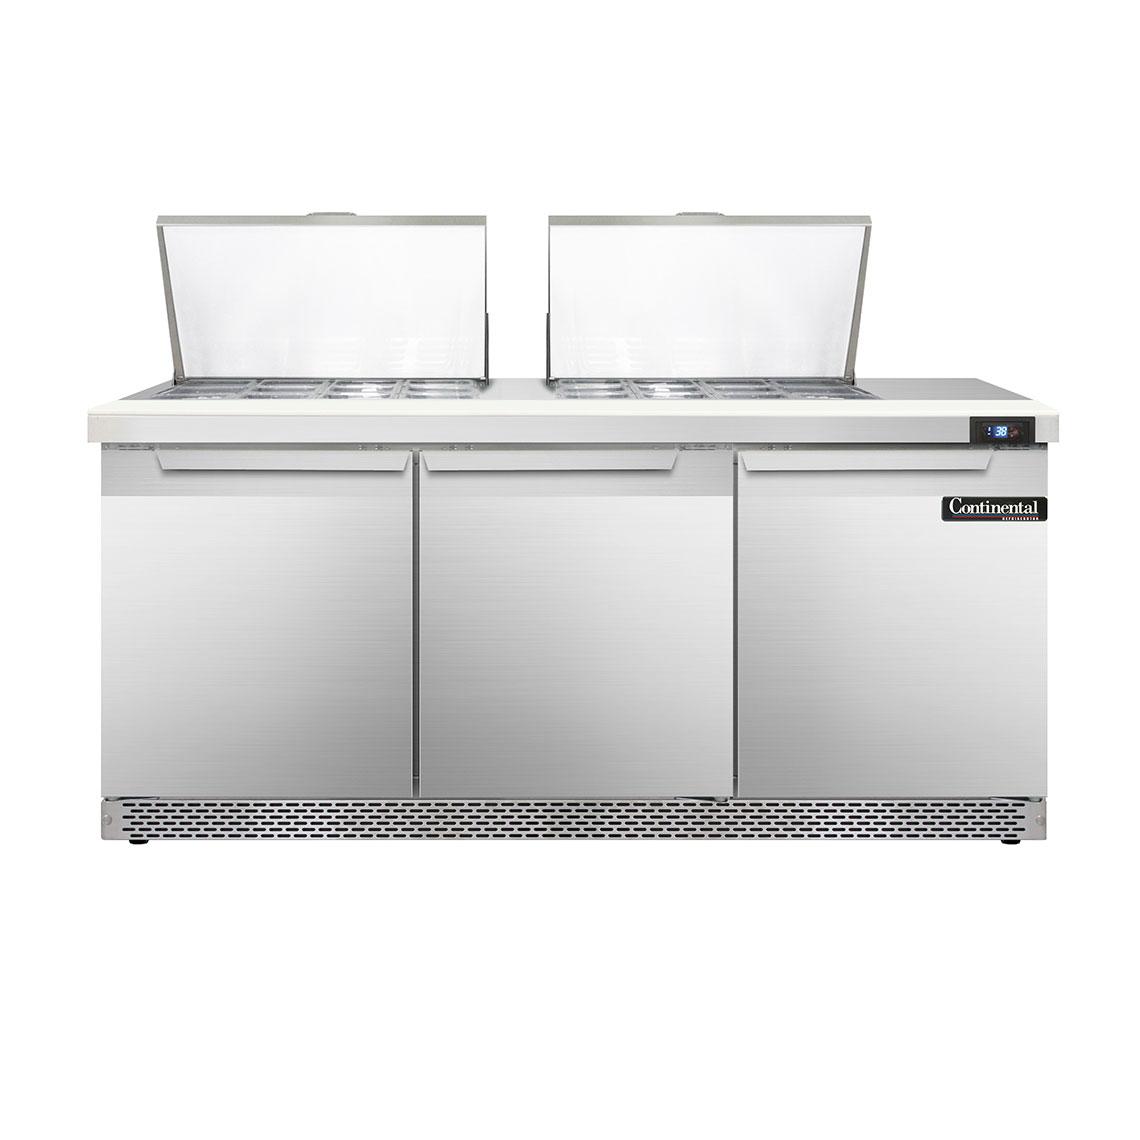 Continental Refrigerator SW72-24M-FB refrigerated counter, mega top sandwich / salad unit